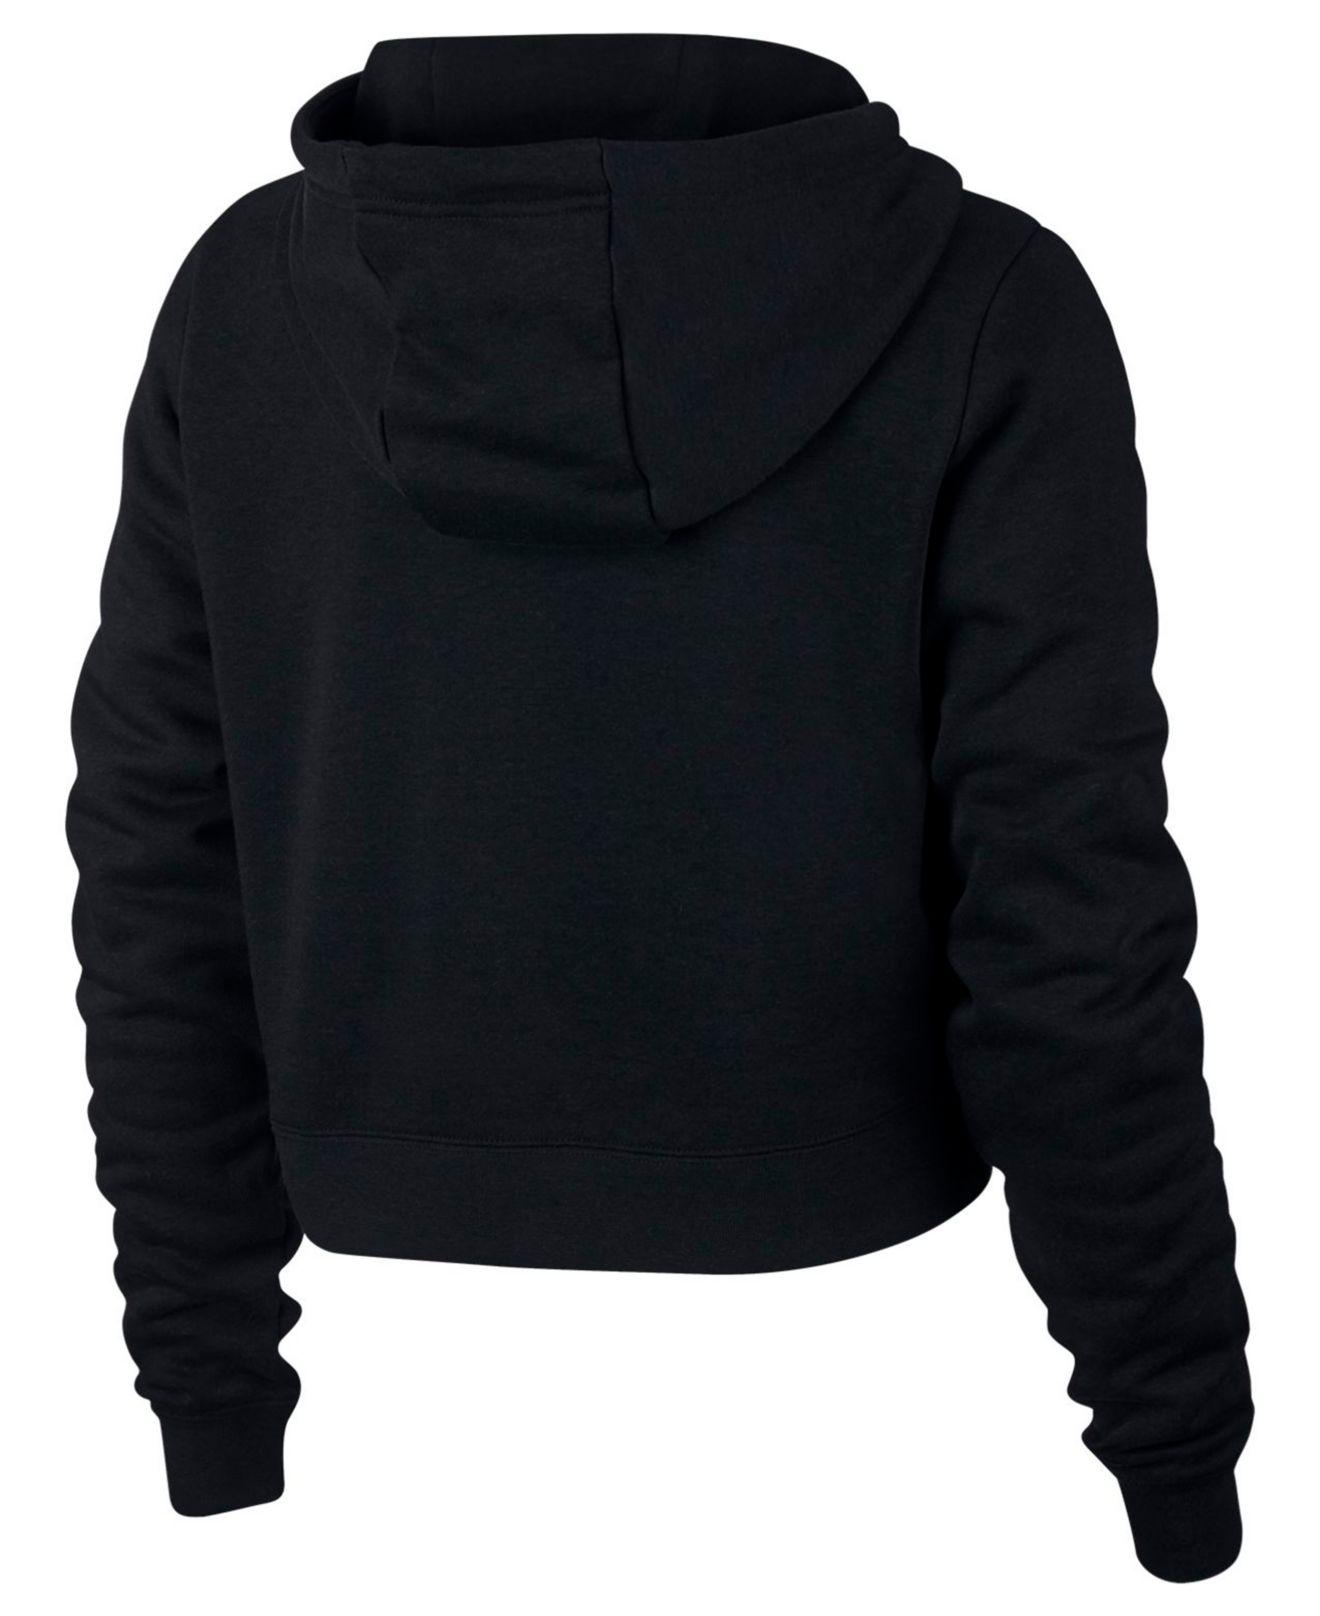 008f2cc3e08b2 Lyst - Nike Sportswear Rally Logo Cropped Fleece Hoodie in Black - Save  51.666666666666664%